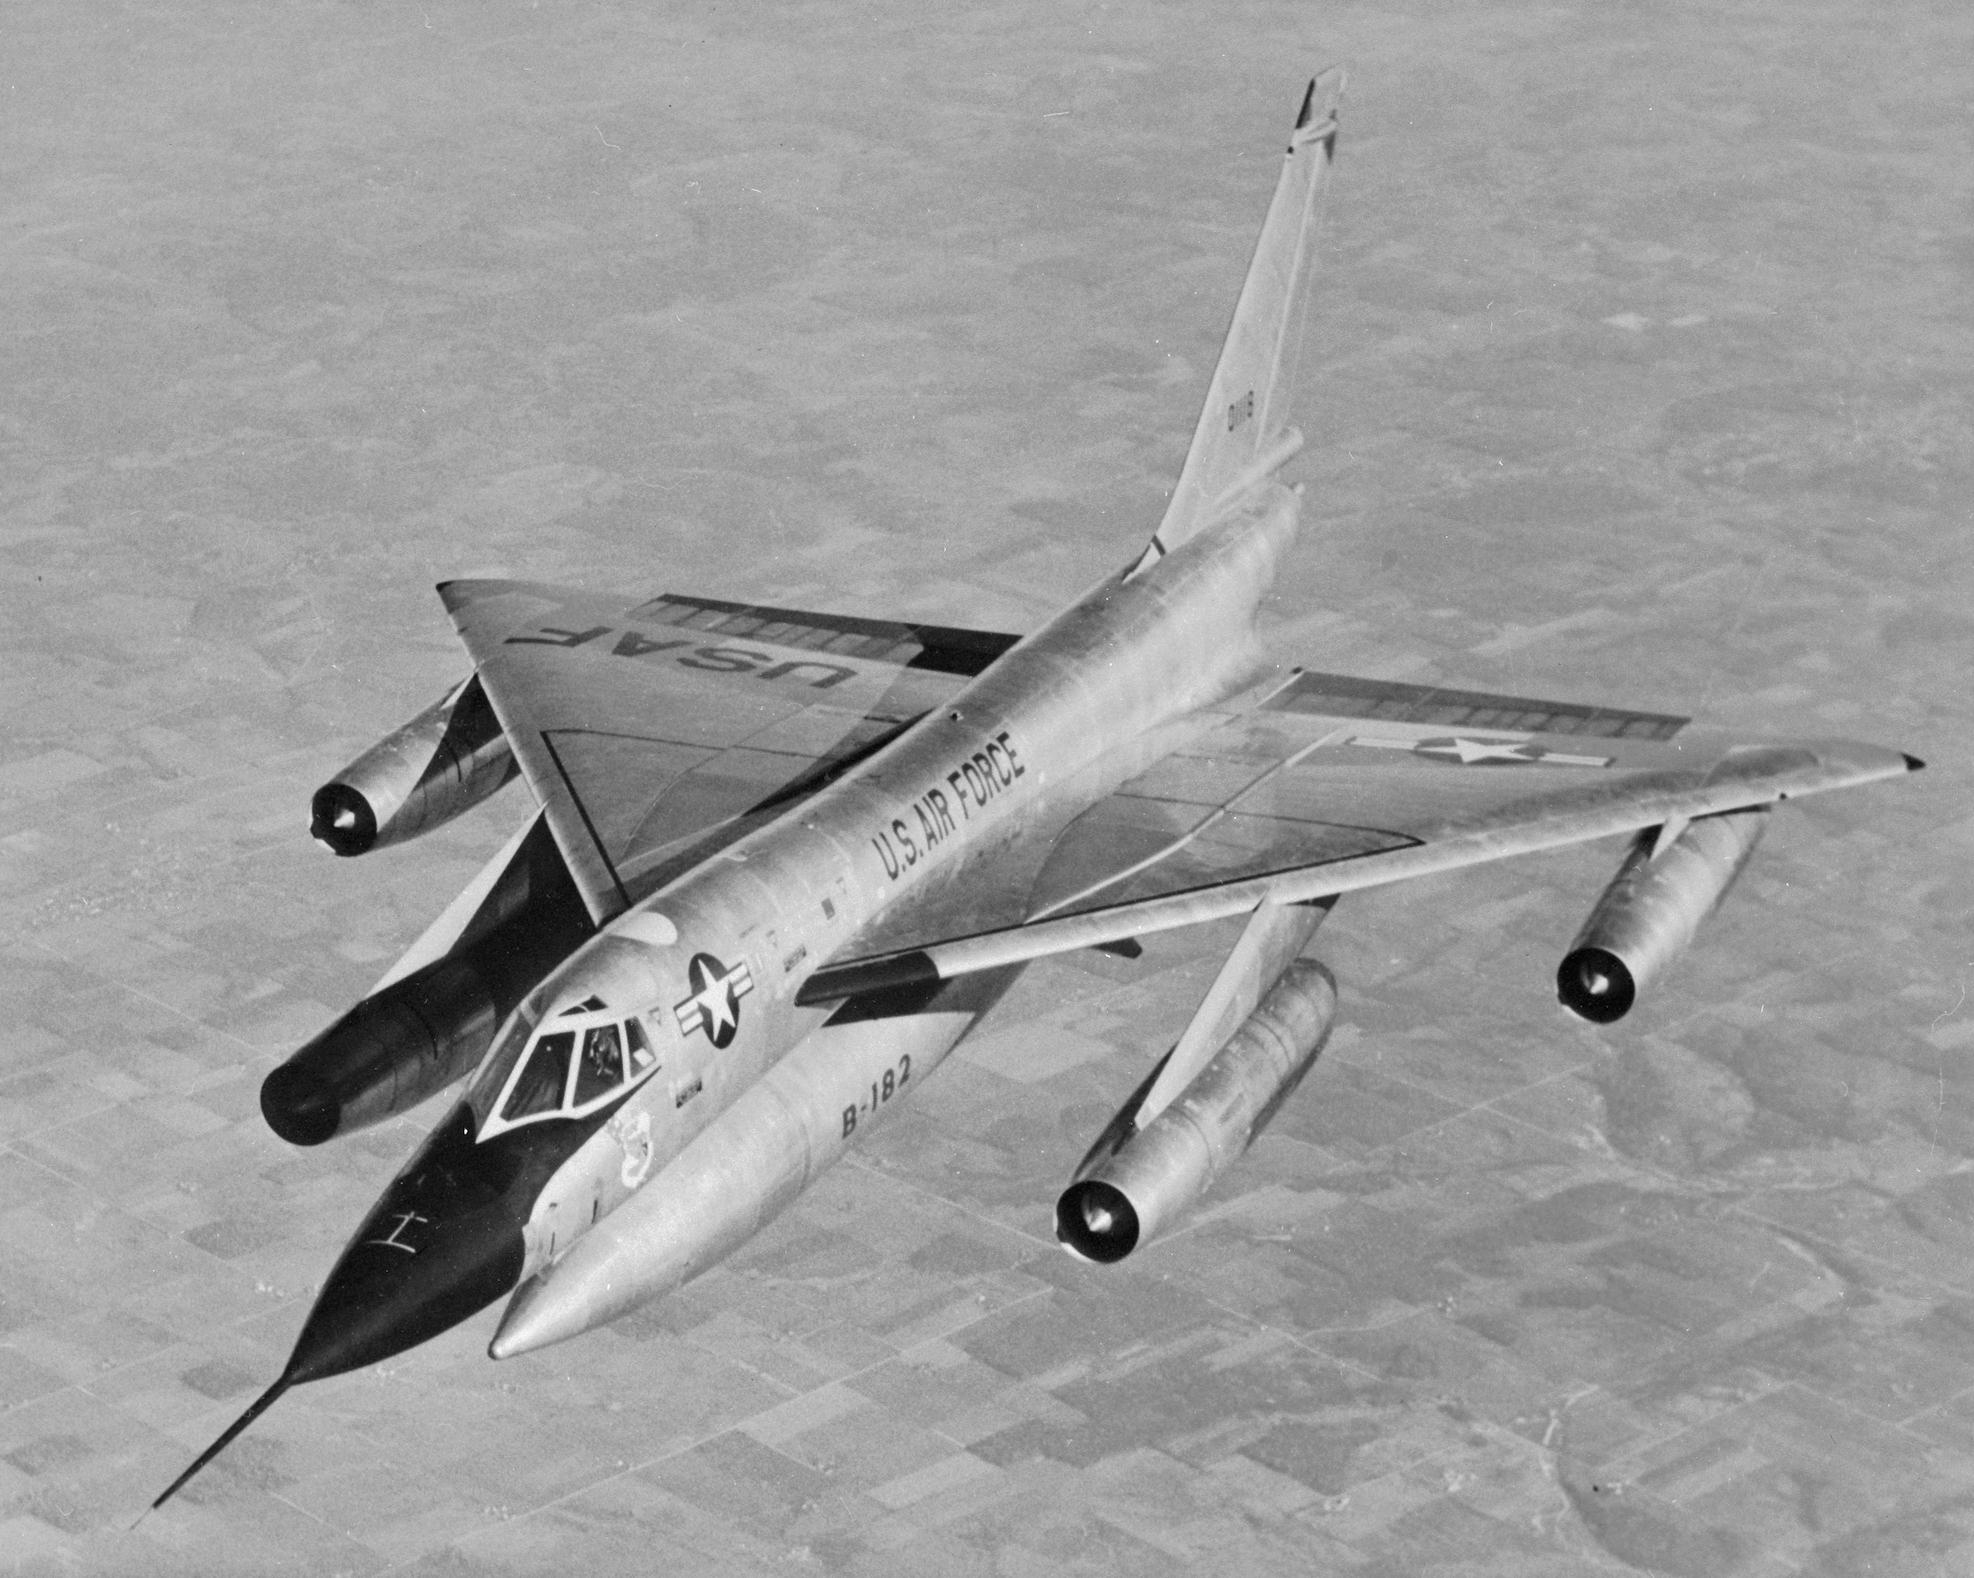 Depiction of Convair B-58 Hustler